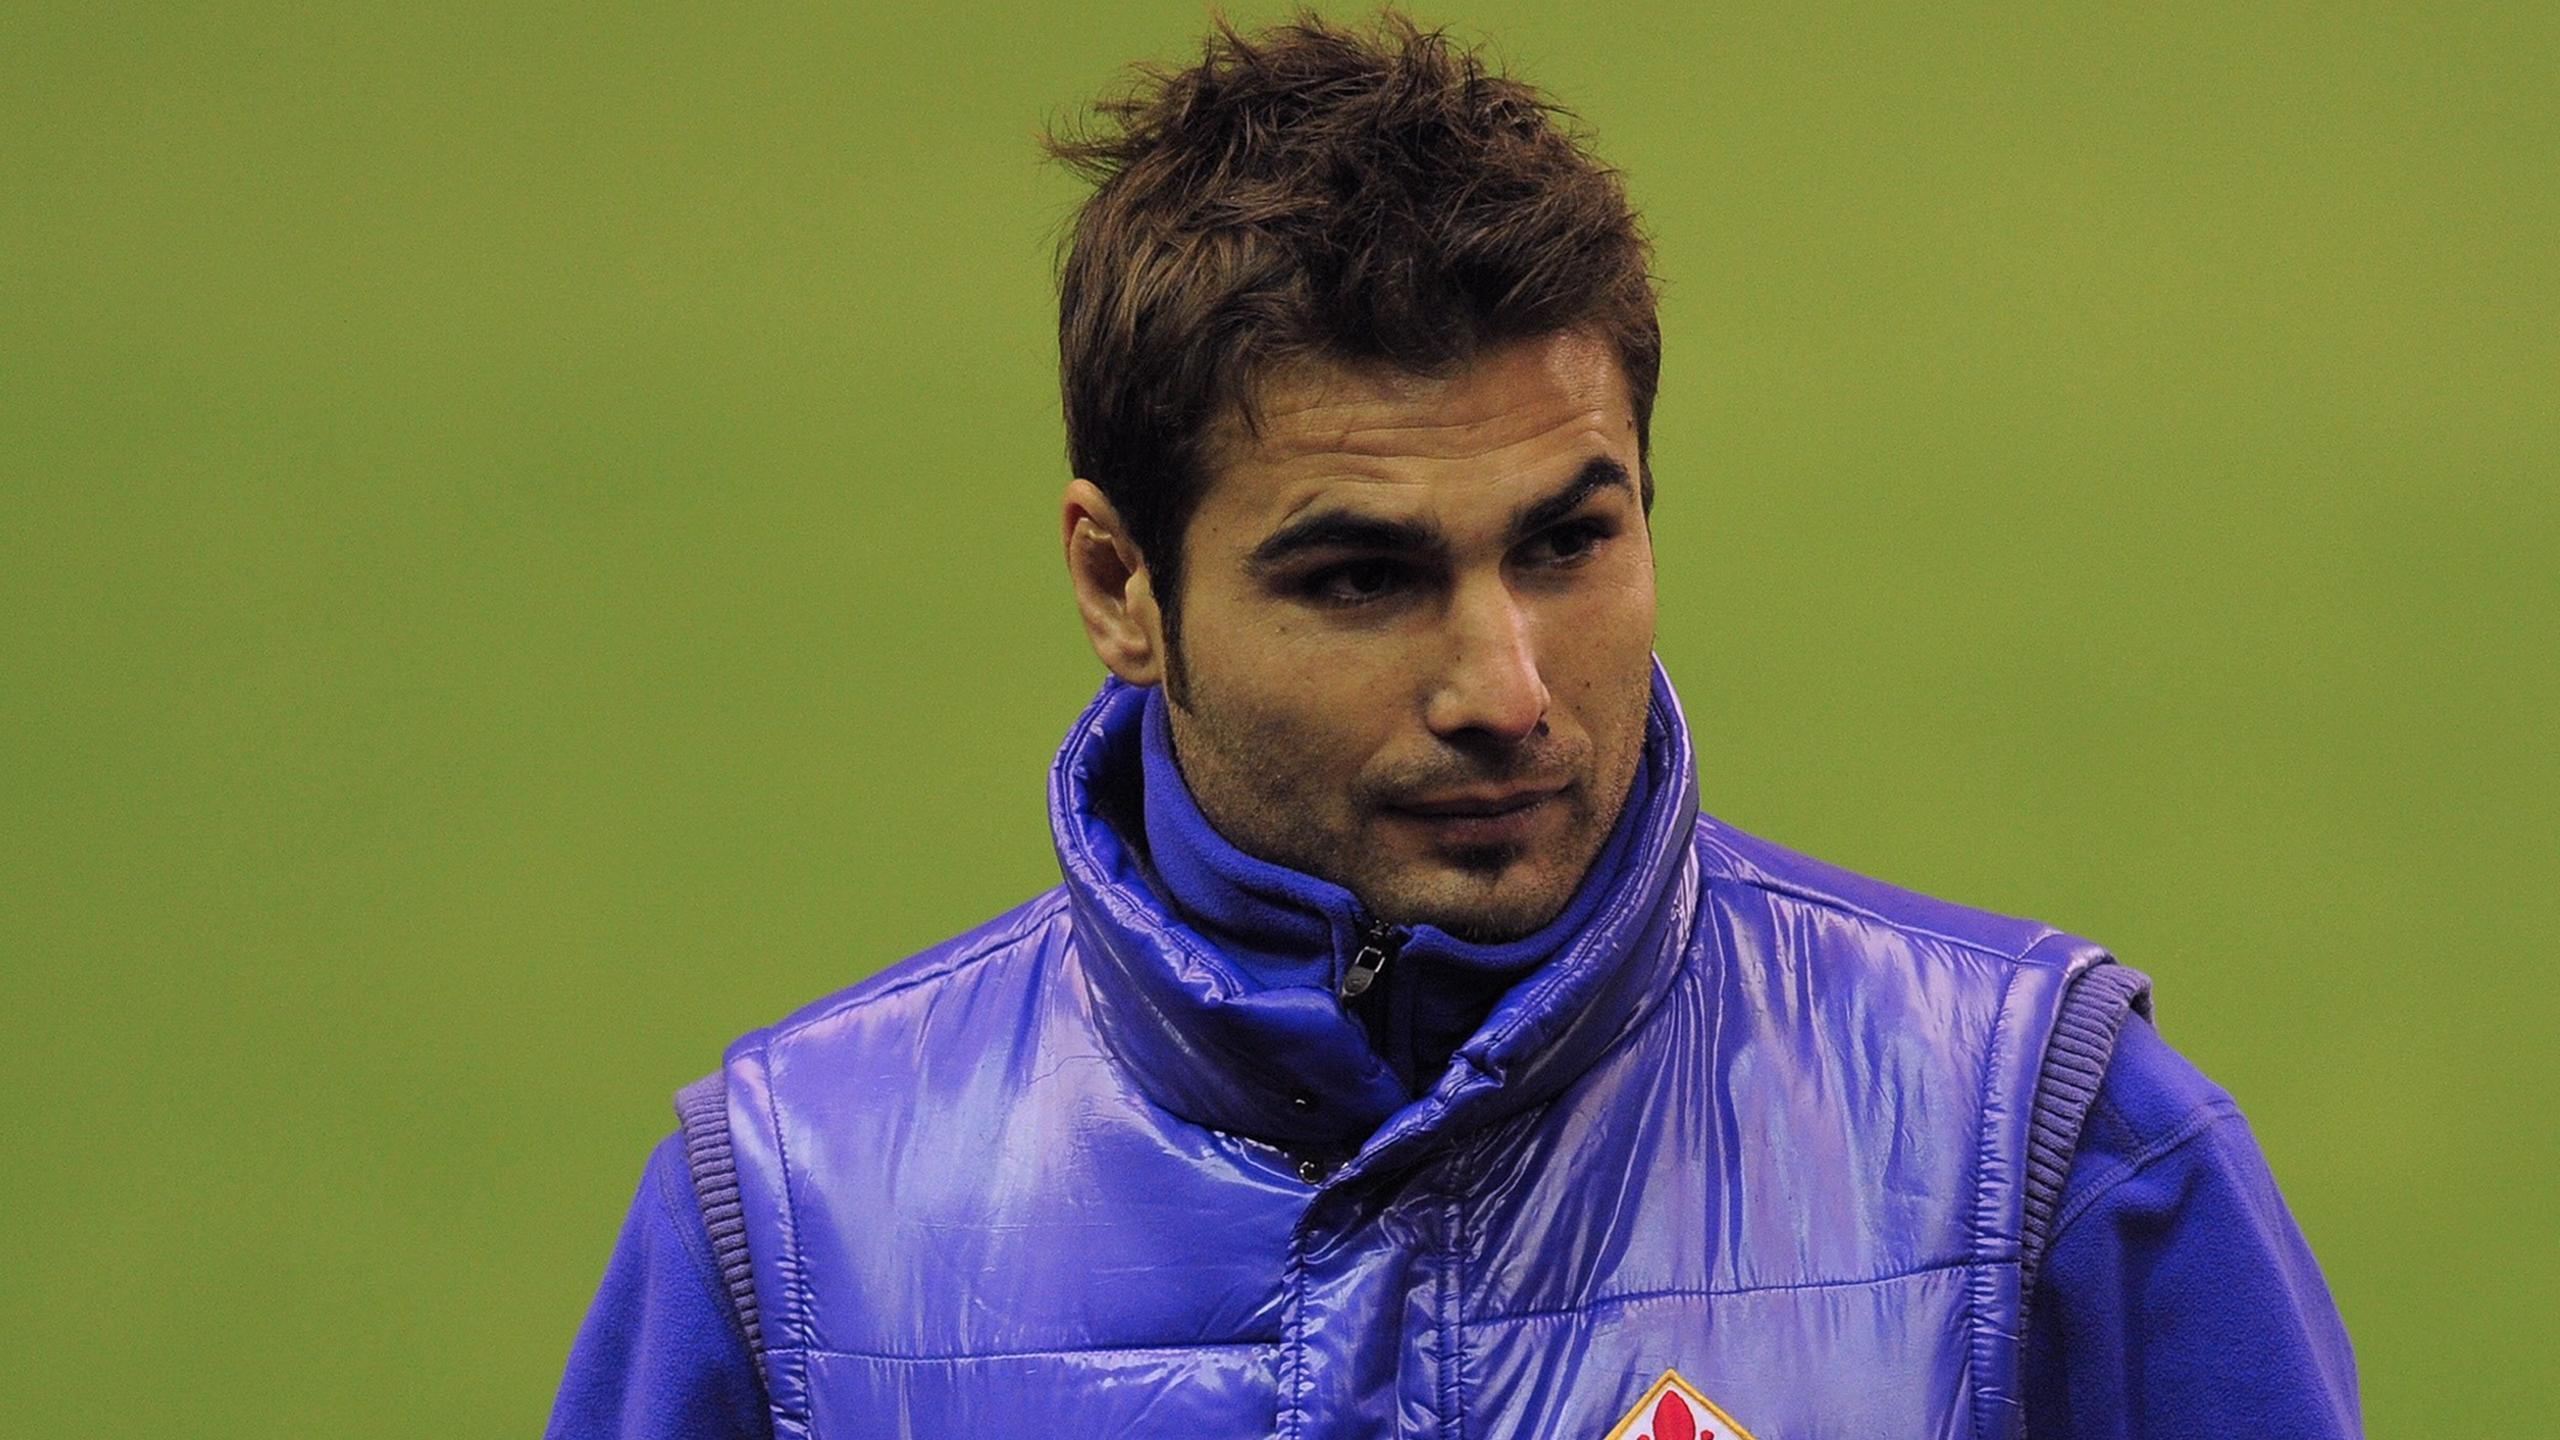 FOOTBALL Fiorentina striker Adrian Mutu